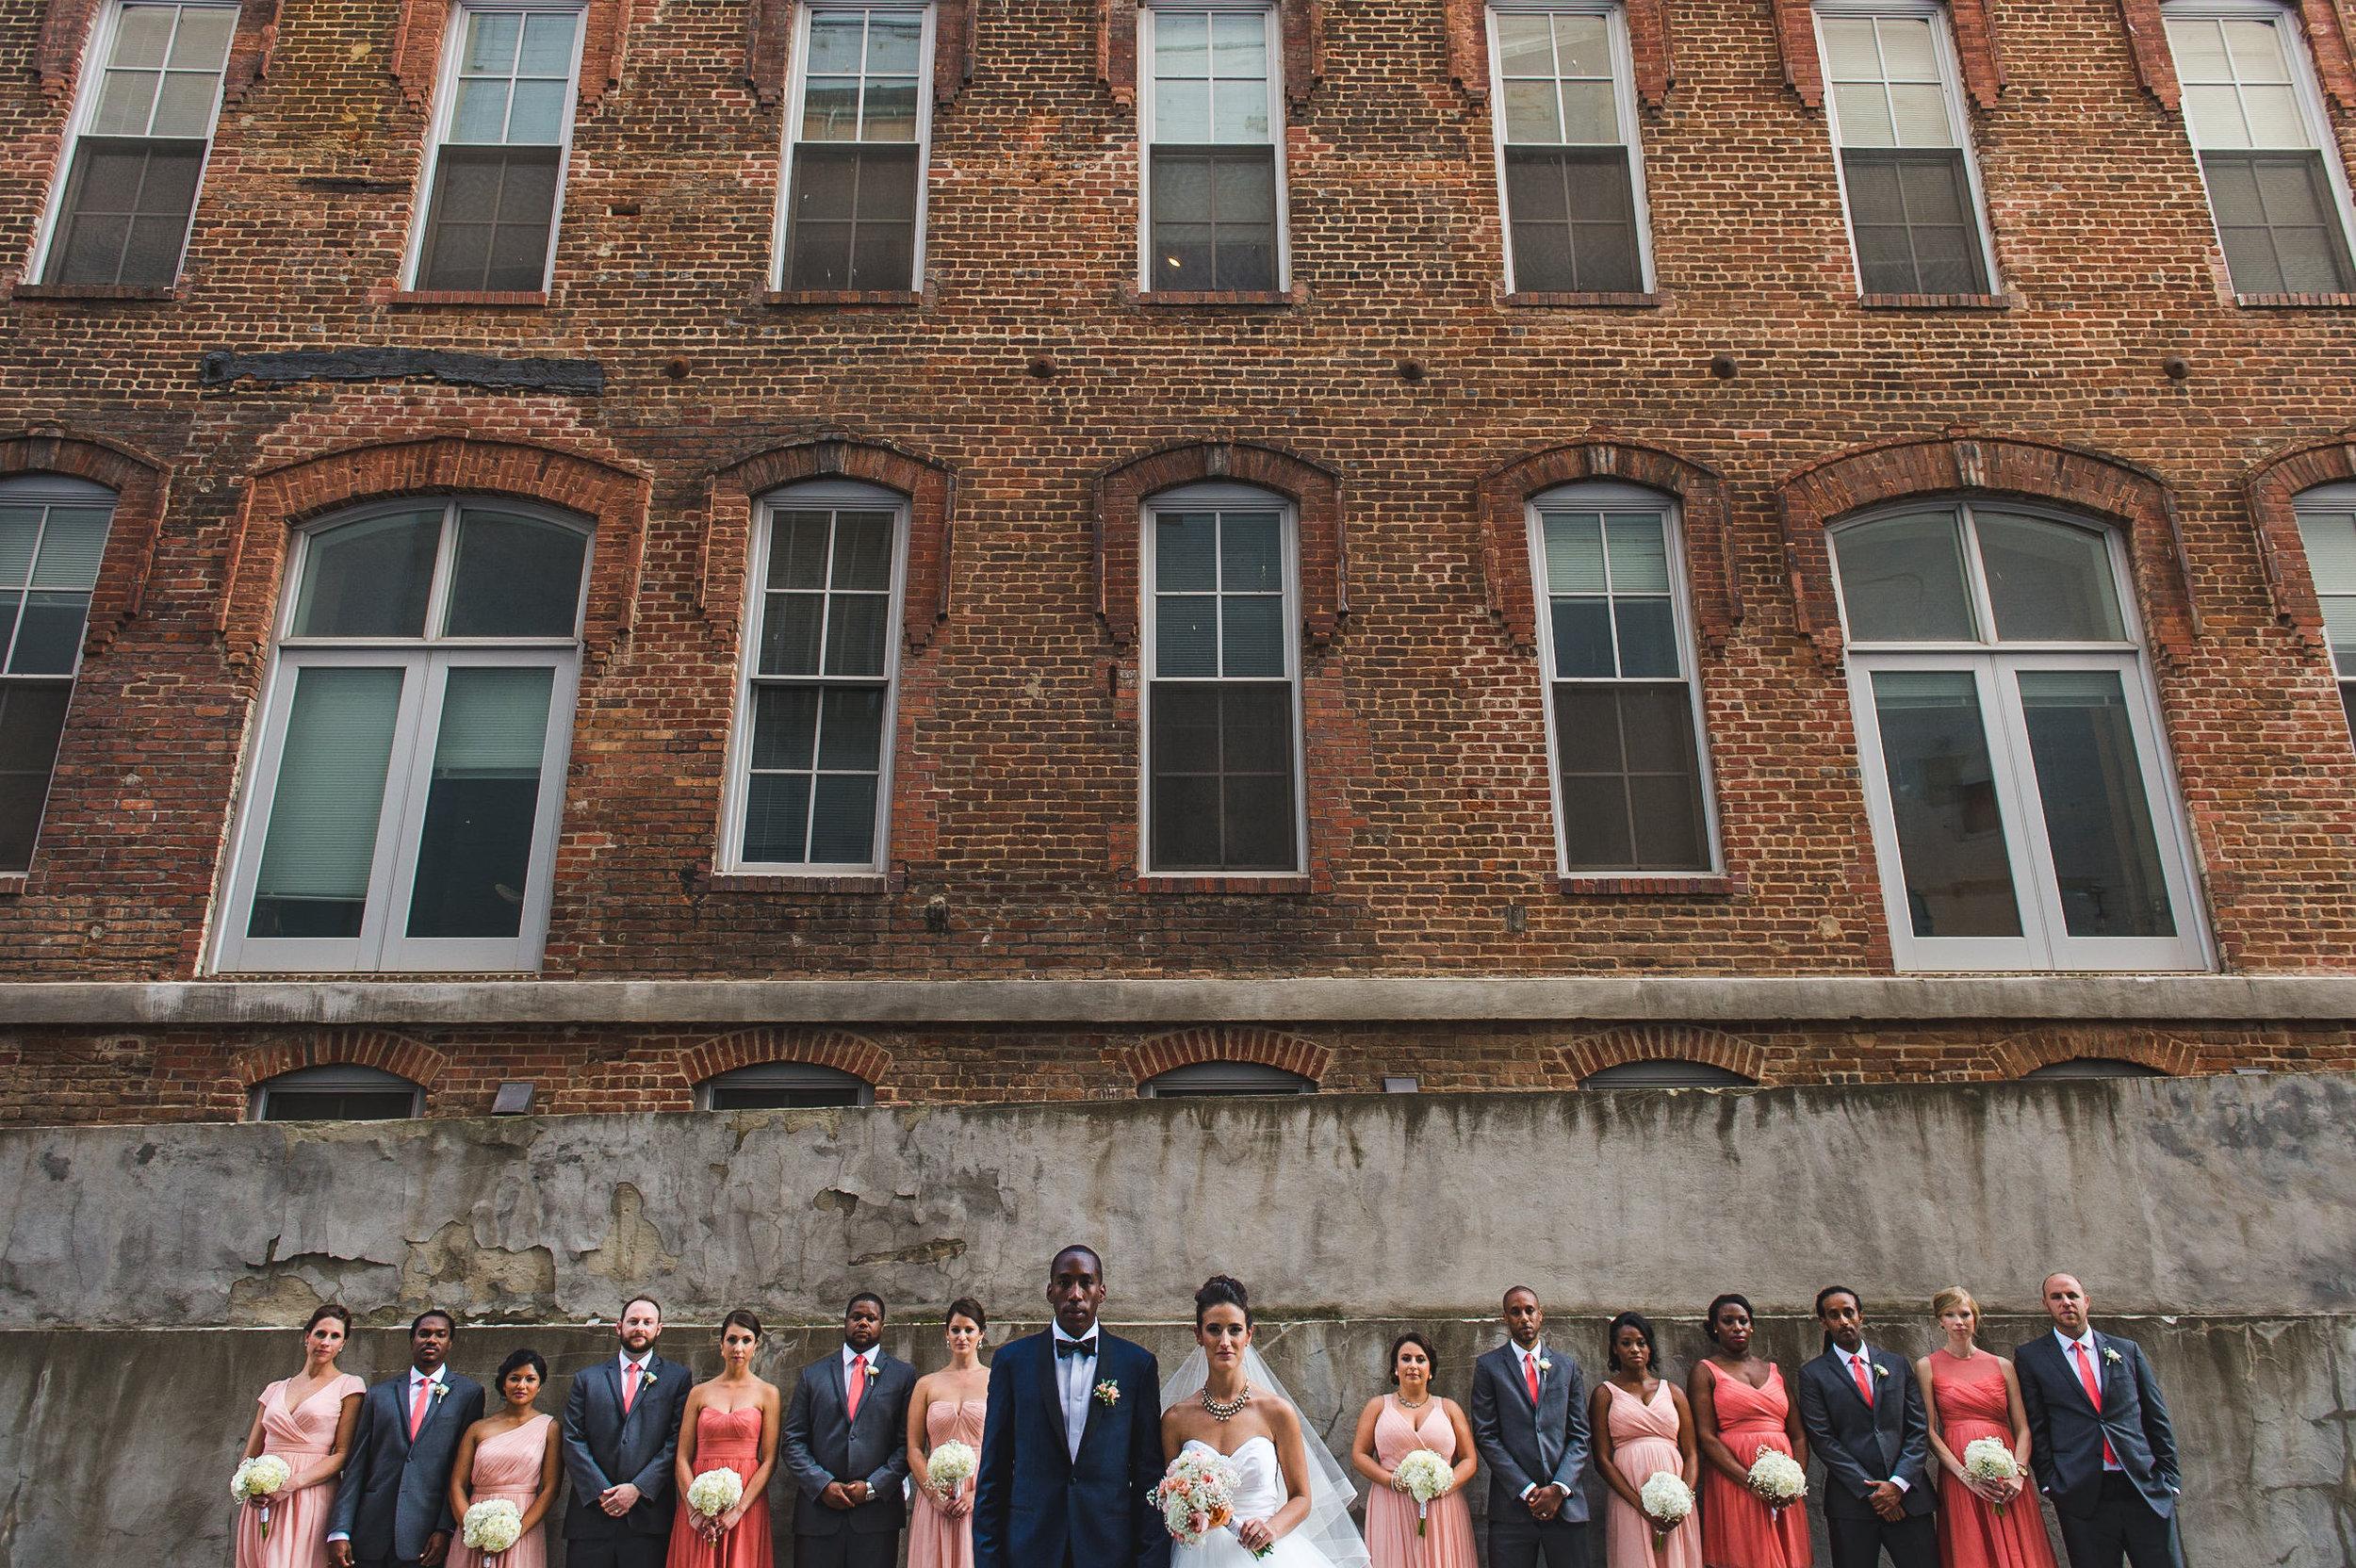 21c Museum Hotel Durham North Carolina Wedding-18.jpg